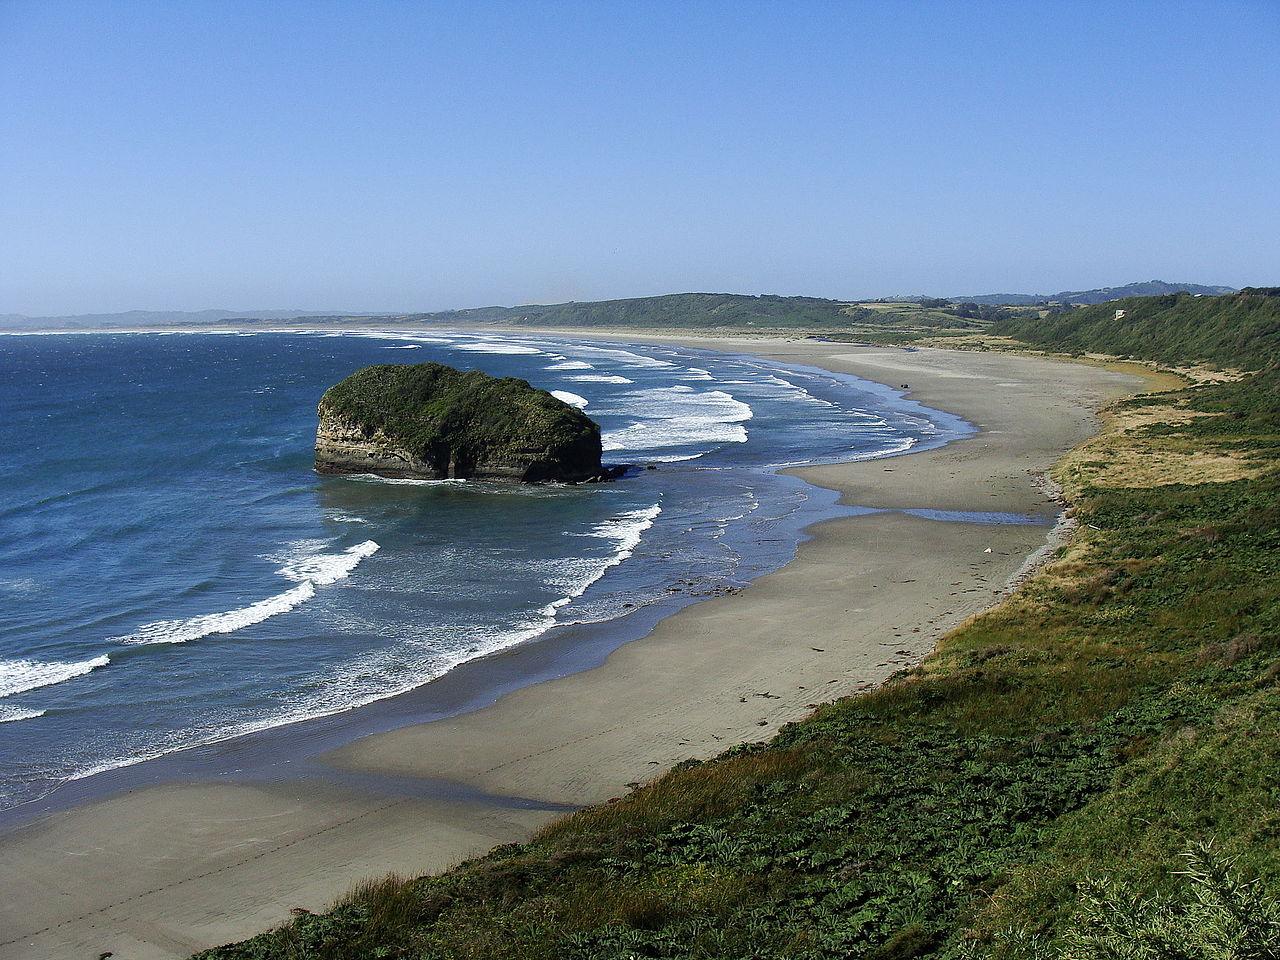 Автор фото - carlos.navarro from Concepción, Chile. Лицензия CC BY-SA 2.0, фото с сайта Wikimedia.